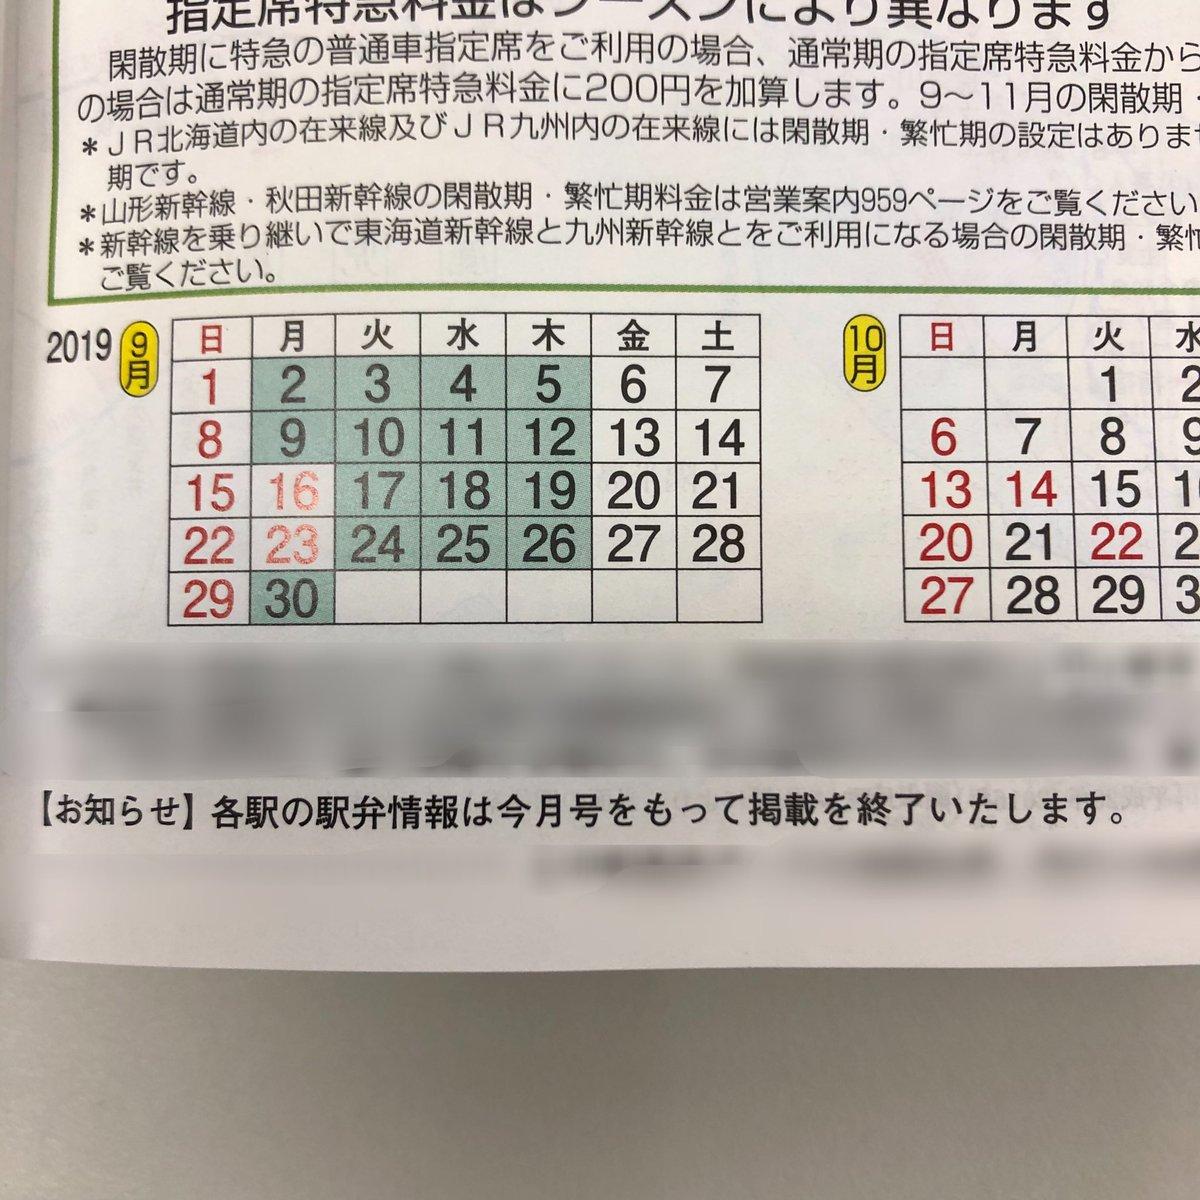 RT @koge_latte: 【悲報】JR時刻表、駅弁情報掲載取りやめ  重要なことがとてもさらっと記されている。 https://t.co/dYwzzQDlgu